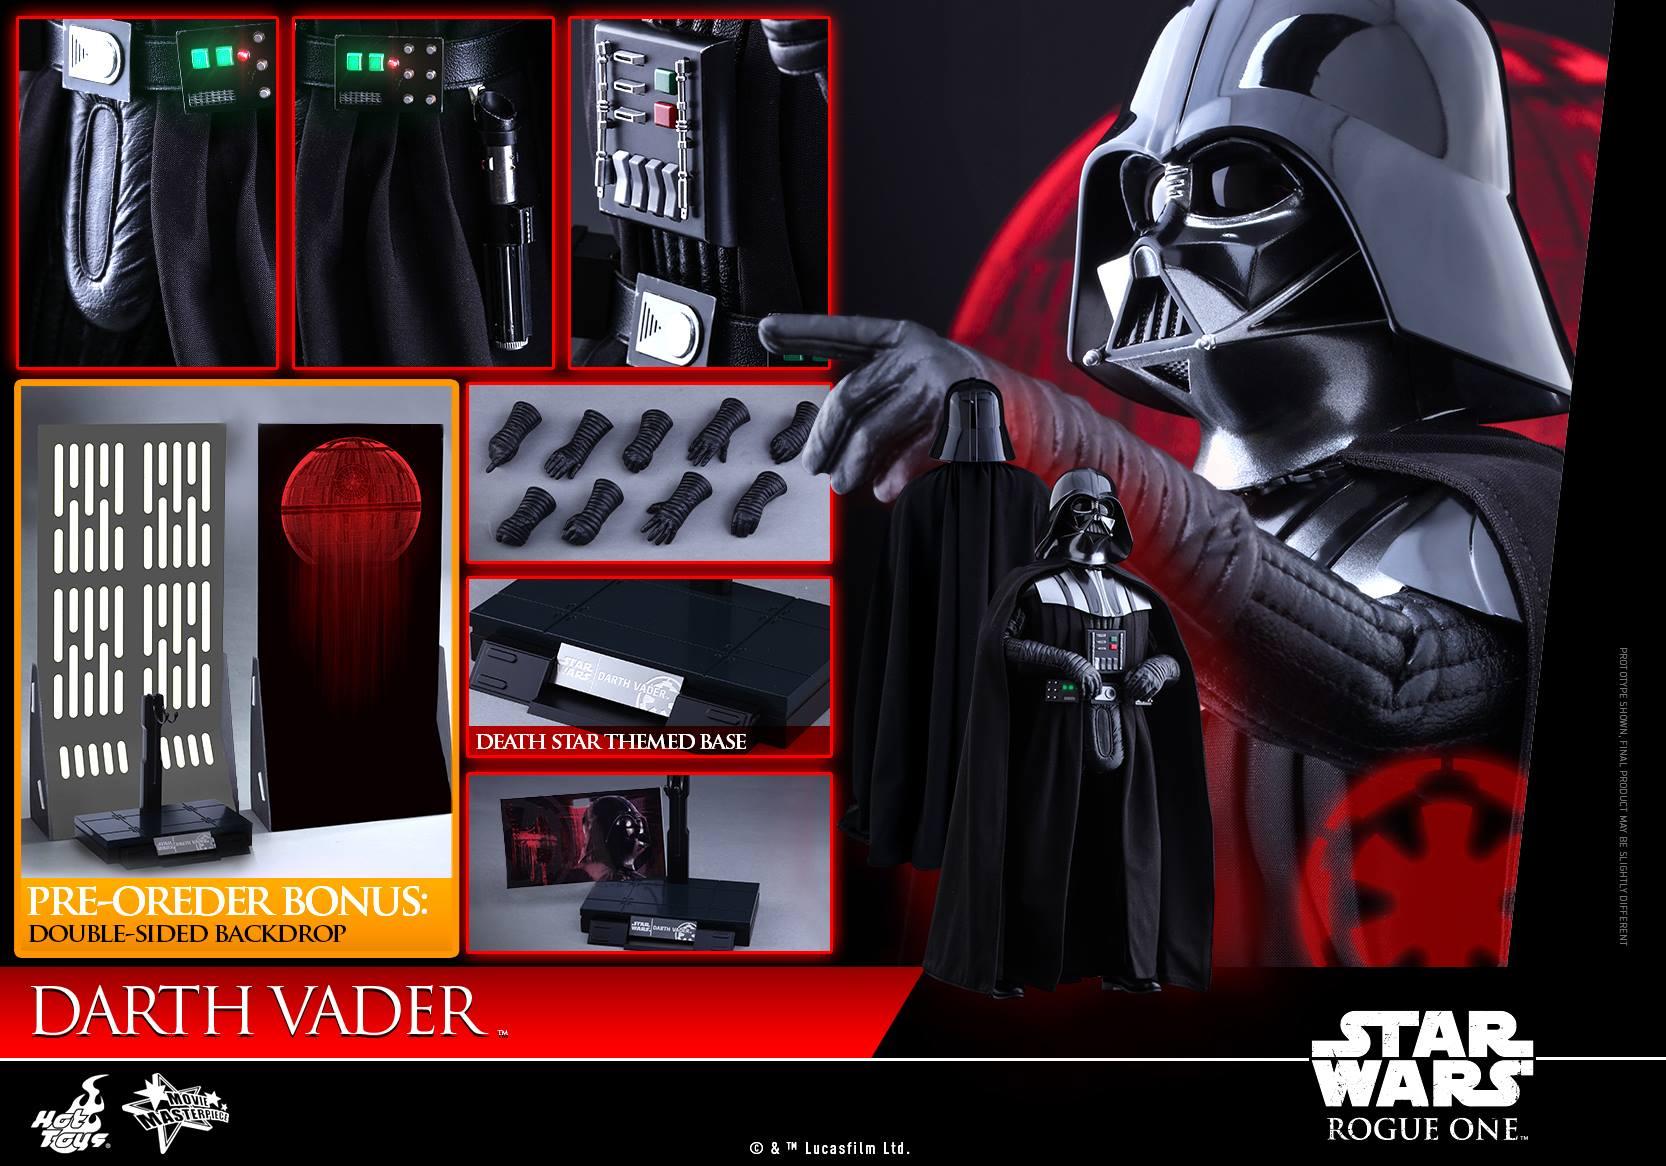 Hot Toys Darth Vader Rogue One A Star Wars Story